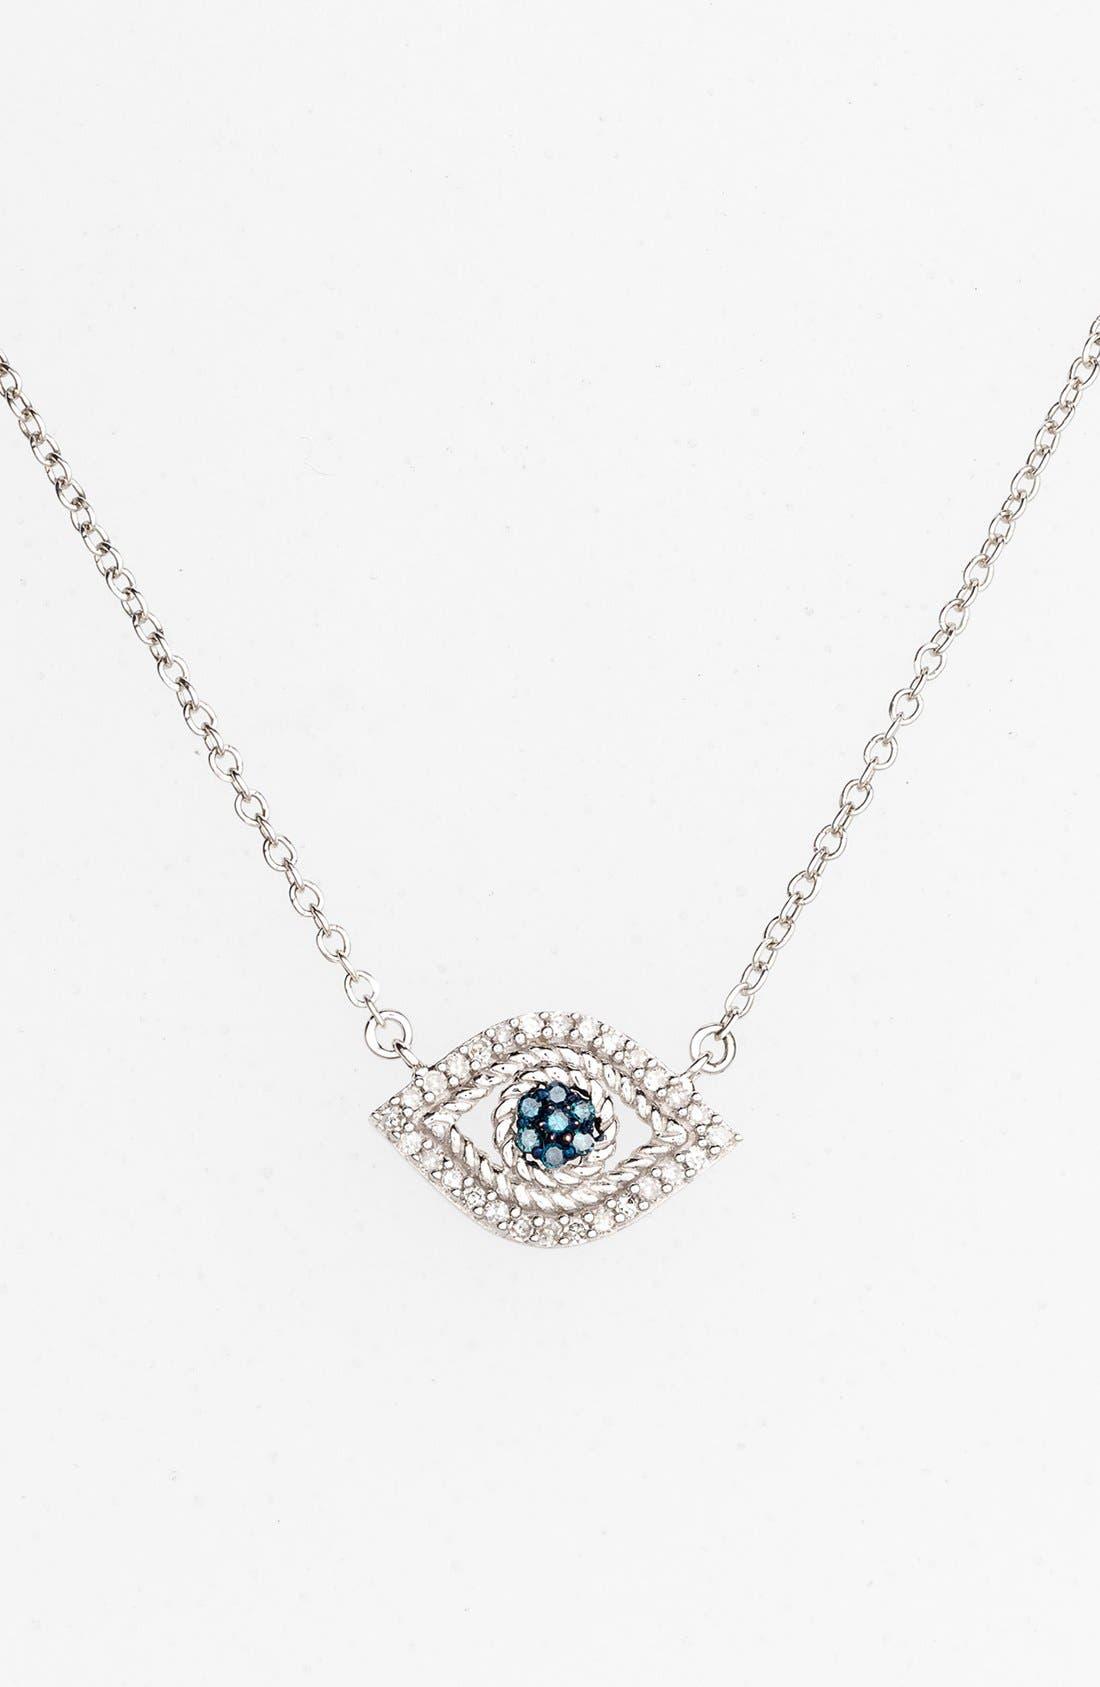 Alternate Image 1 Selected - Adina Reyter 'Evil Eye' Diamond & Sapphire Pendant Necklace